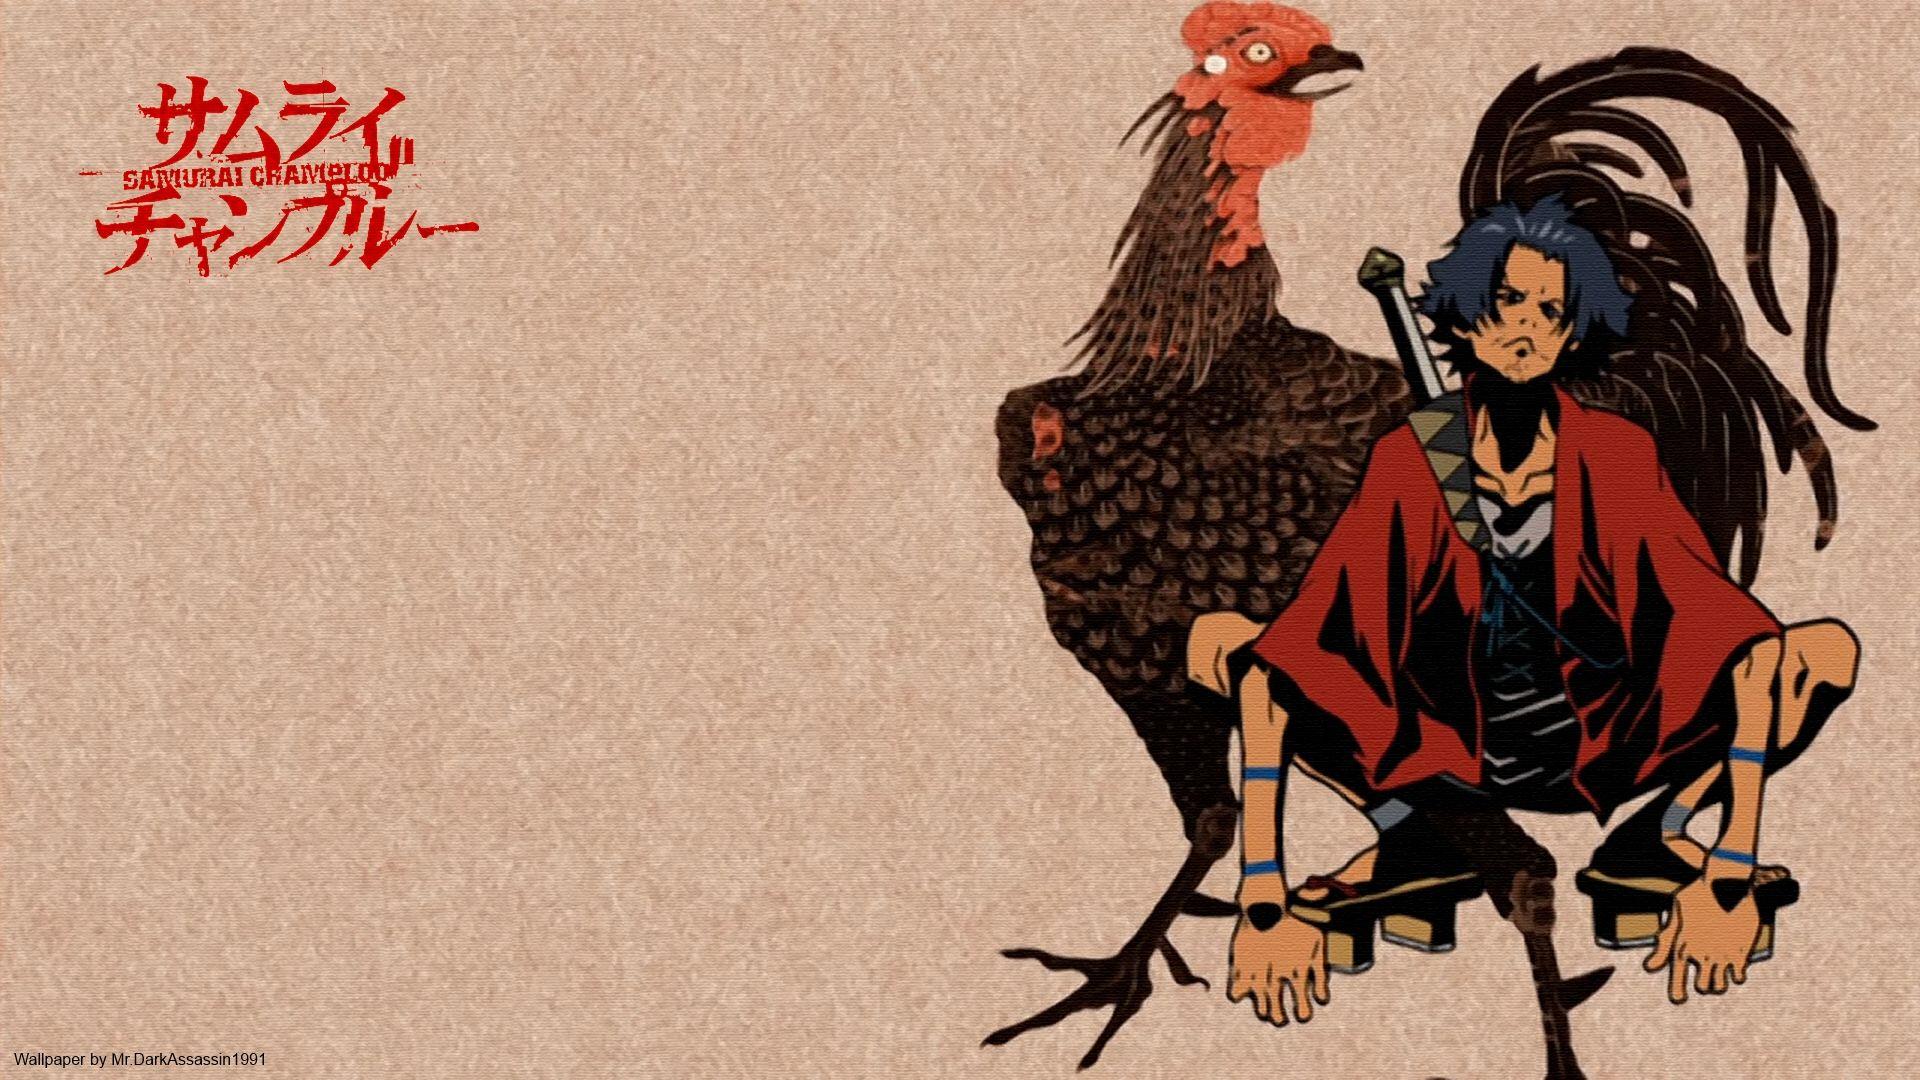 Pin by Гервант из Ливии on WORKING | Samurai champloo